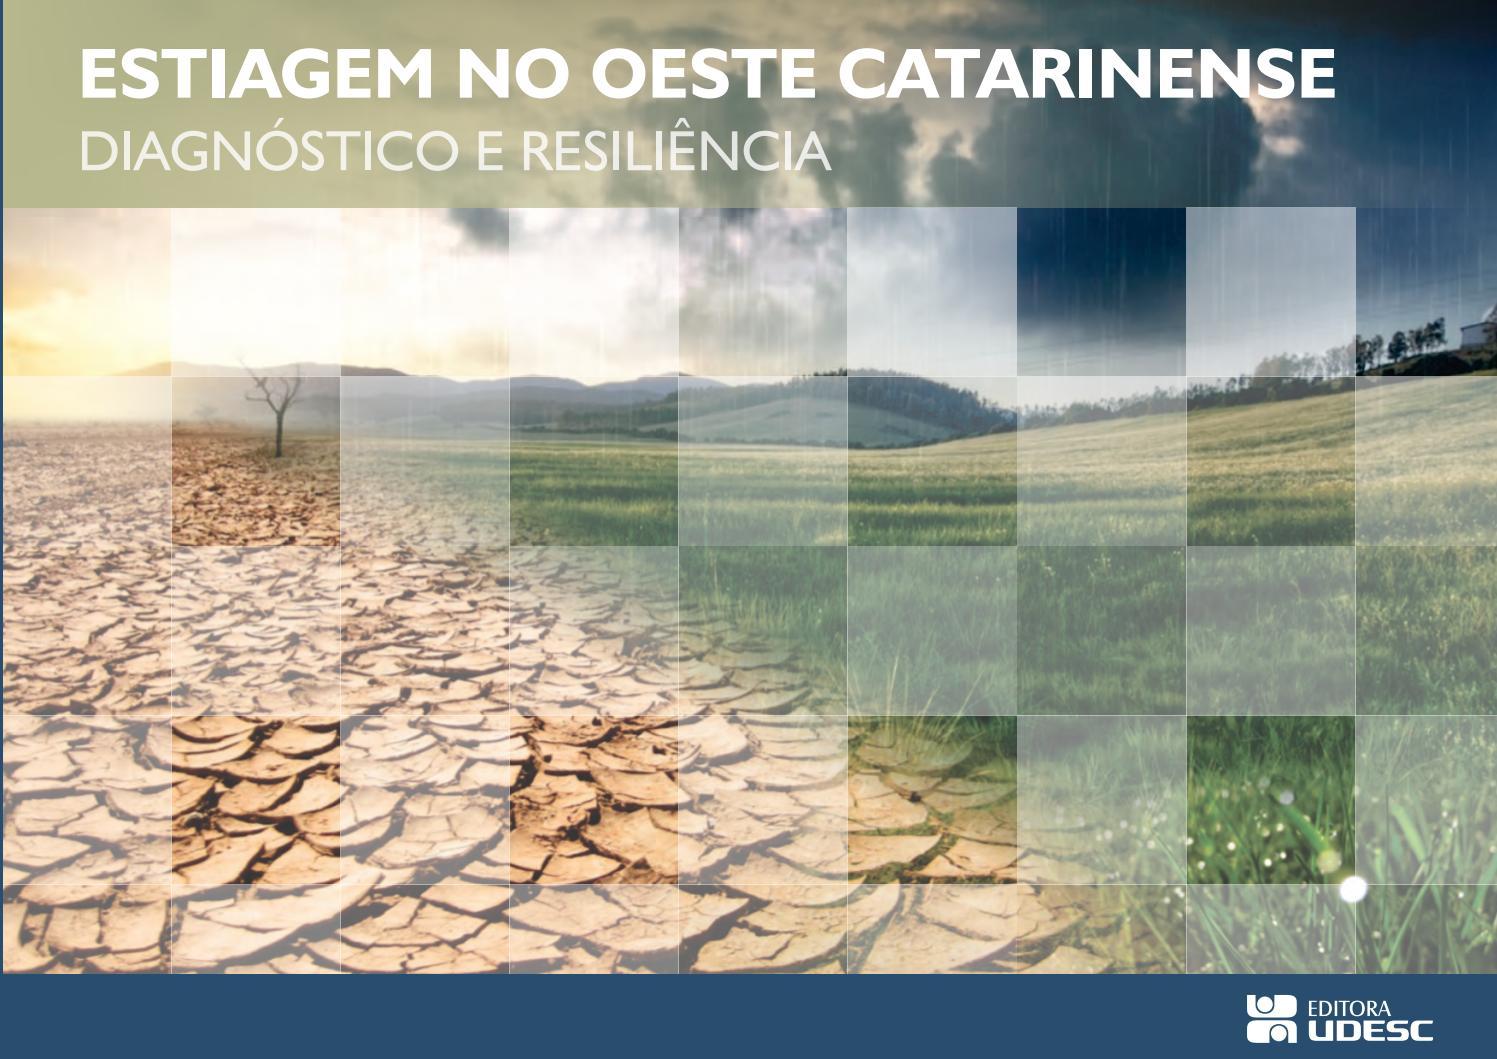 Estiagem no Oeste Catarinense by chico.udesc - issuu d7cdfffe5a0f